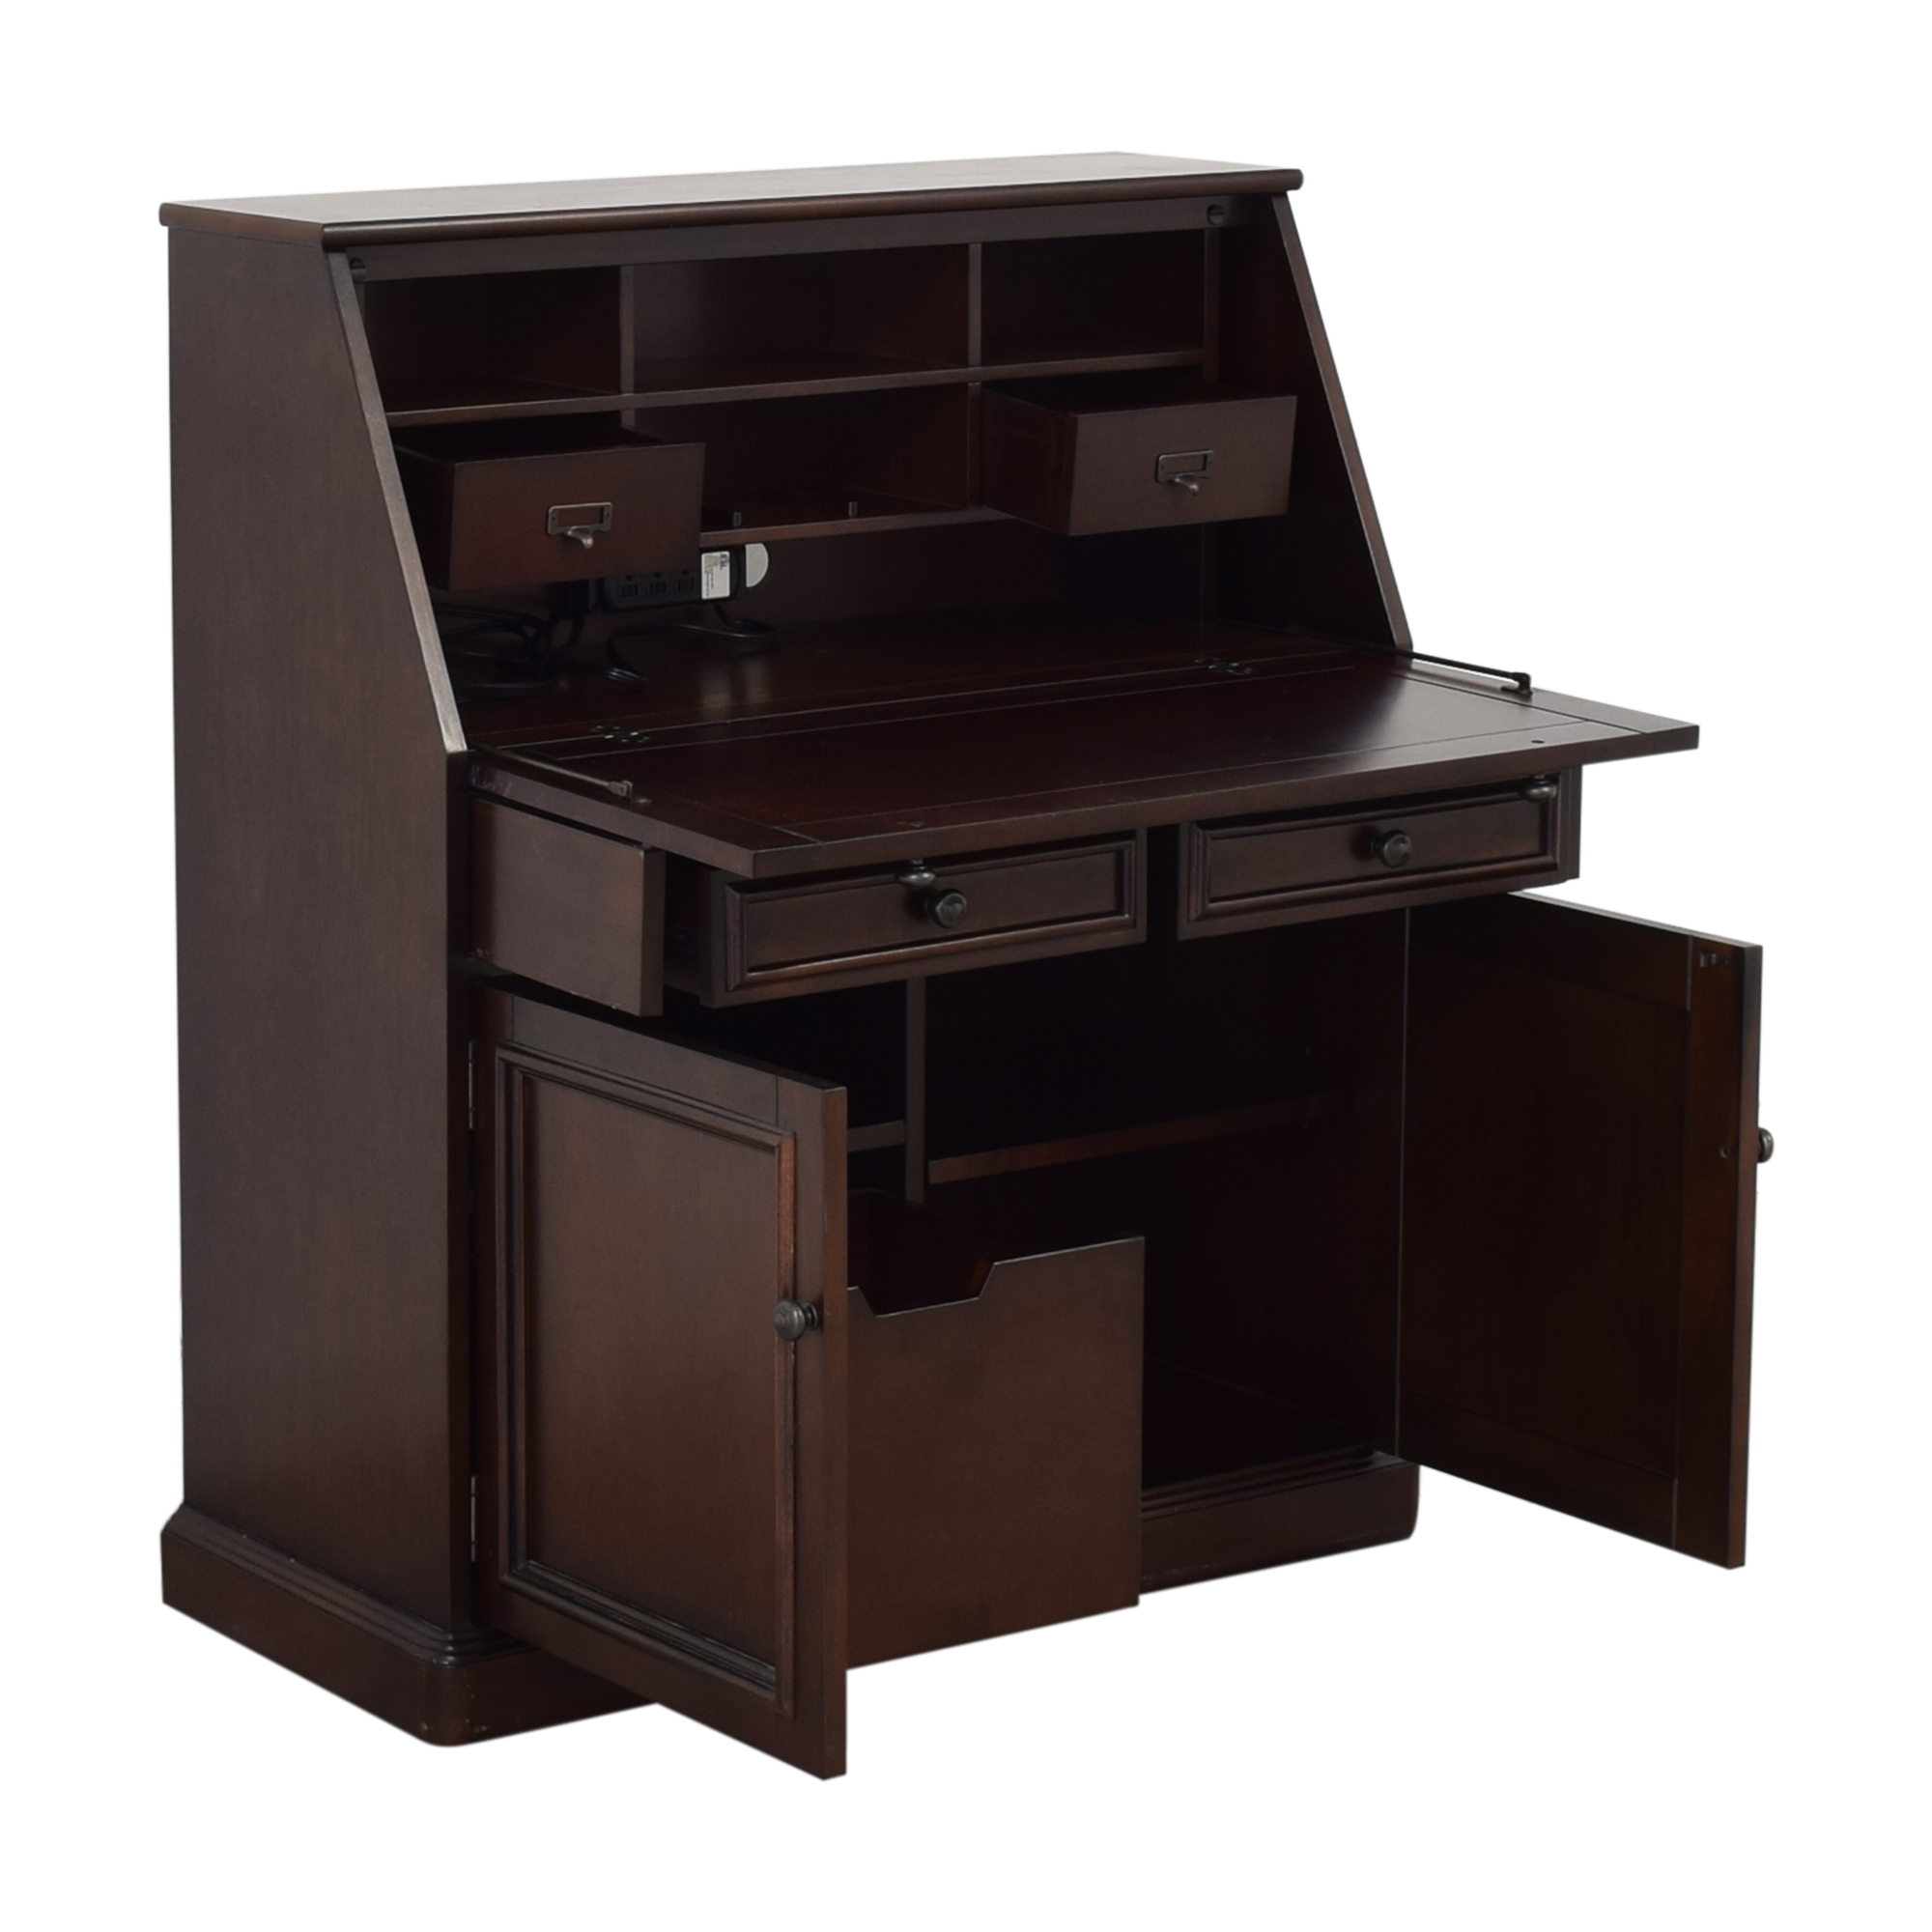 Raymour & Flanigan Raymour & Flanigan Jennings Laptop Desk Armoire on sale